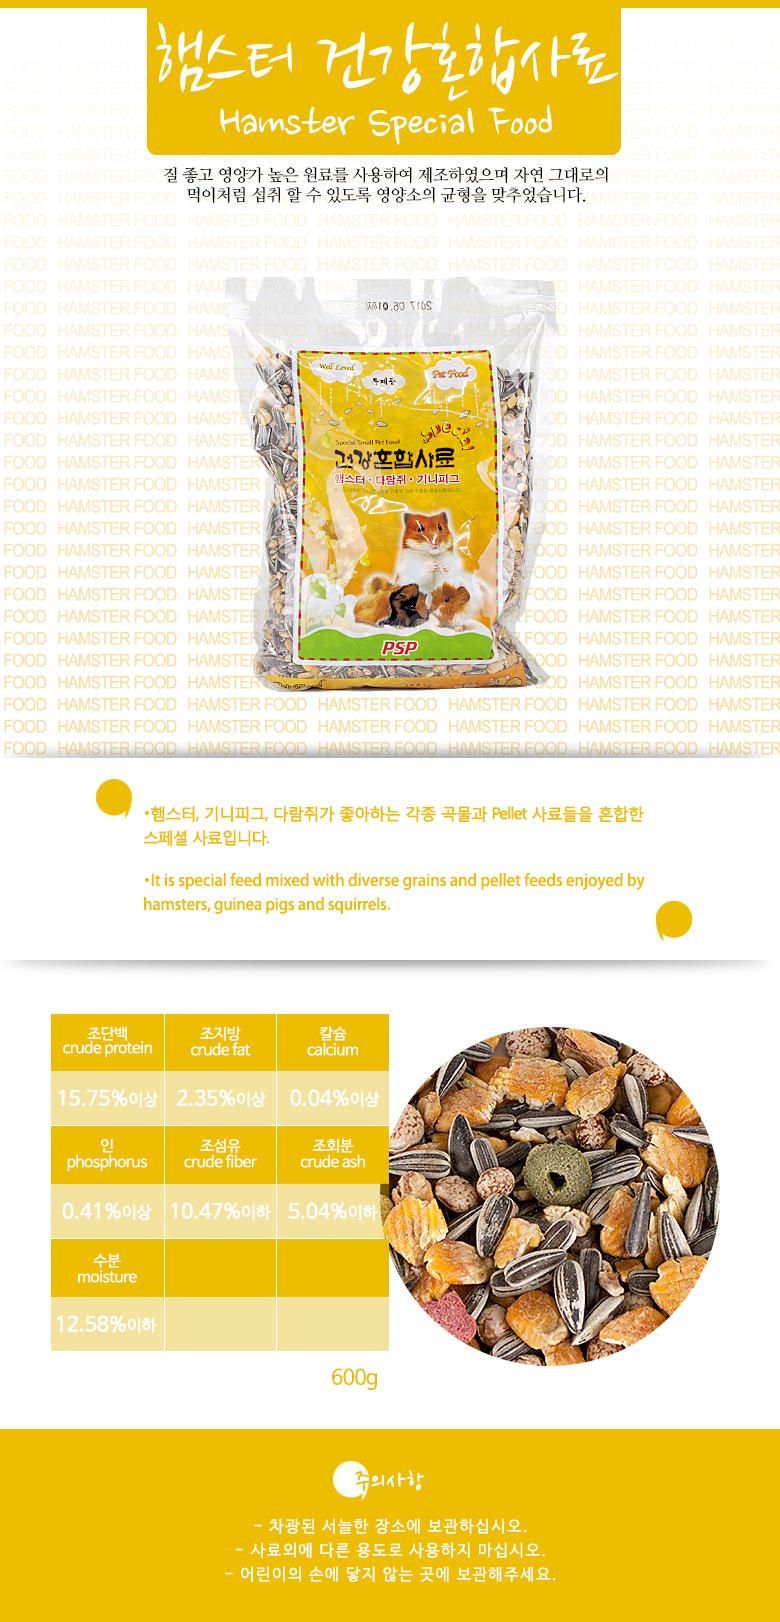 PSP 스페셜 햄스터 기니피그 다람쥐 영양펠렛 600g (곡물첨가 건강혼합사료).jpg